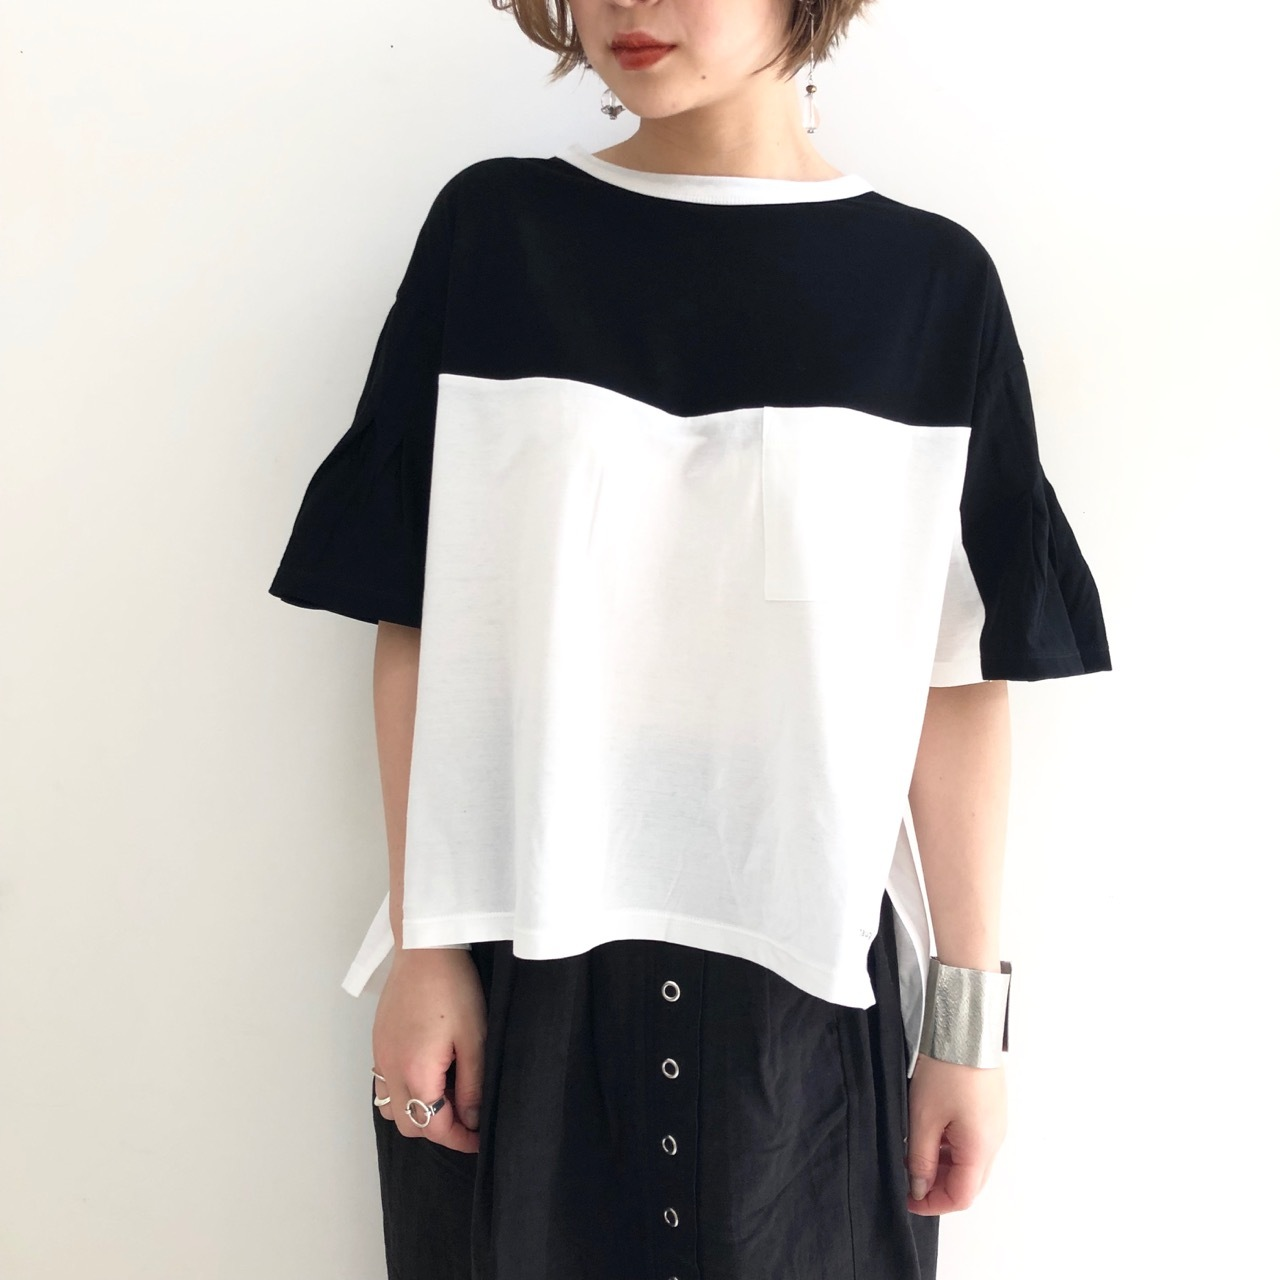 【 ANTGAUGE 】- AB824 - バイカラーTeeシャツ